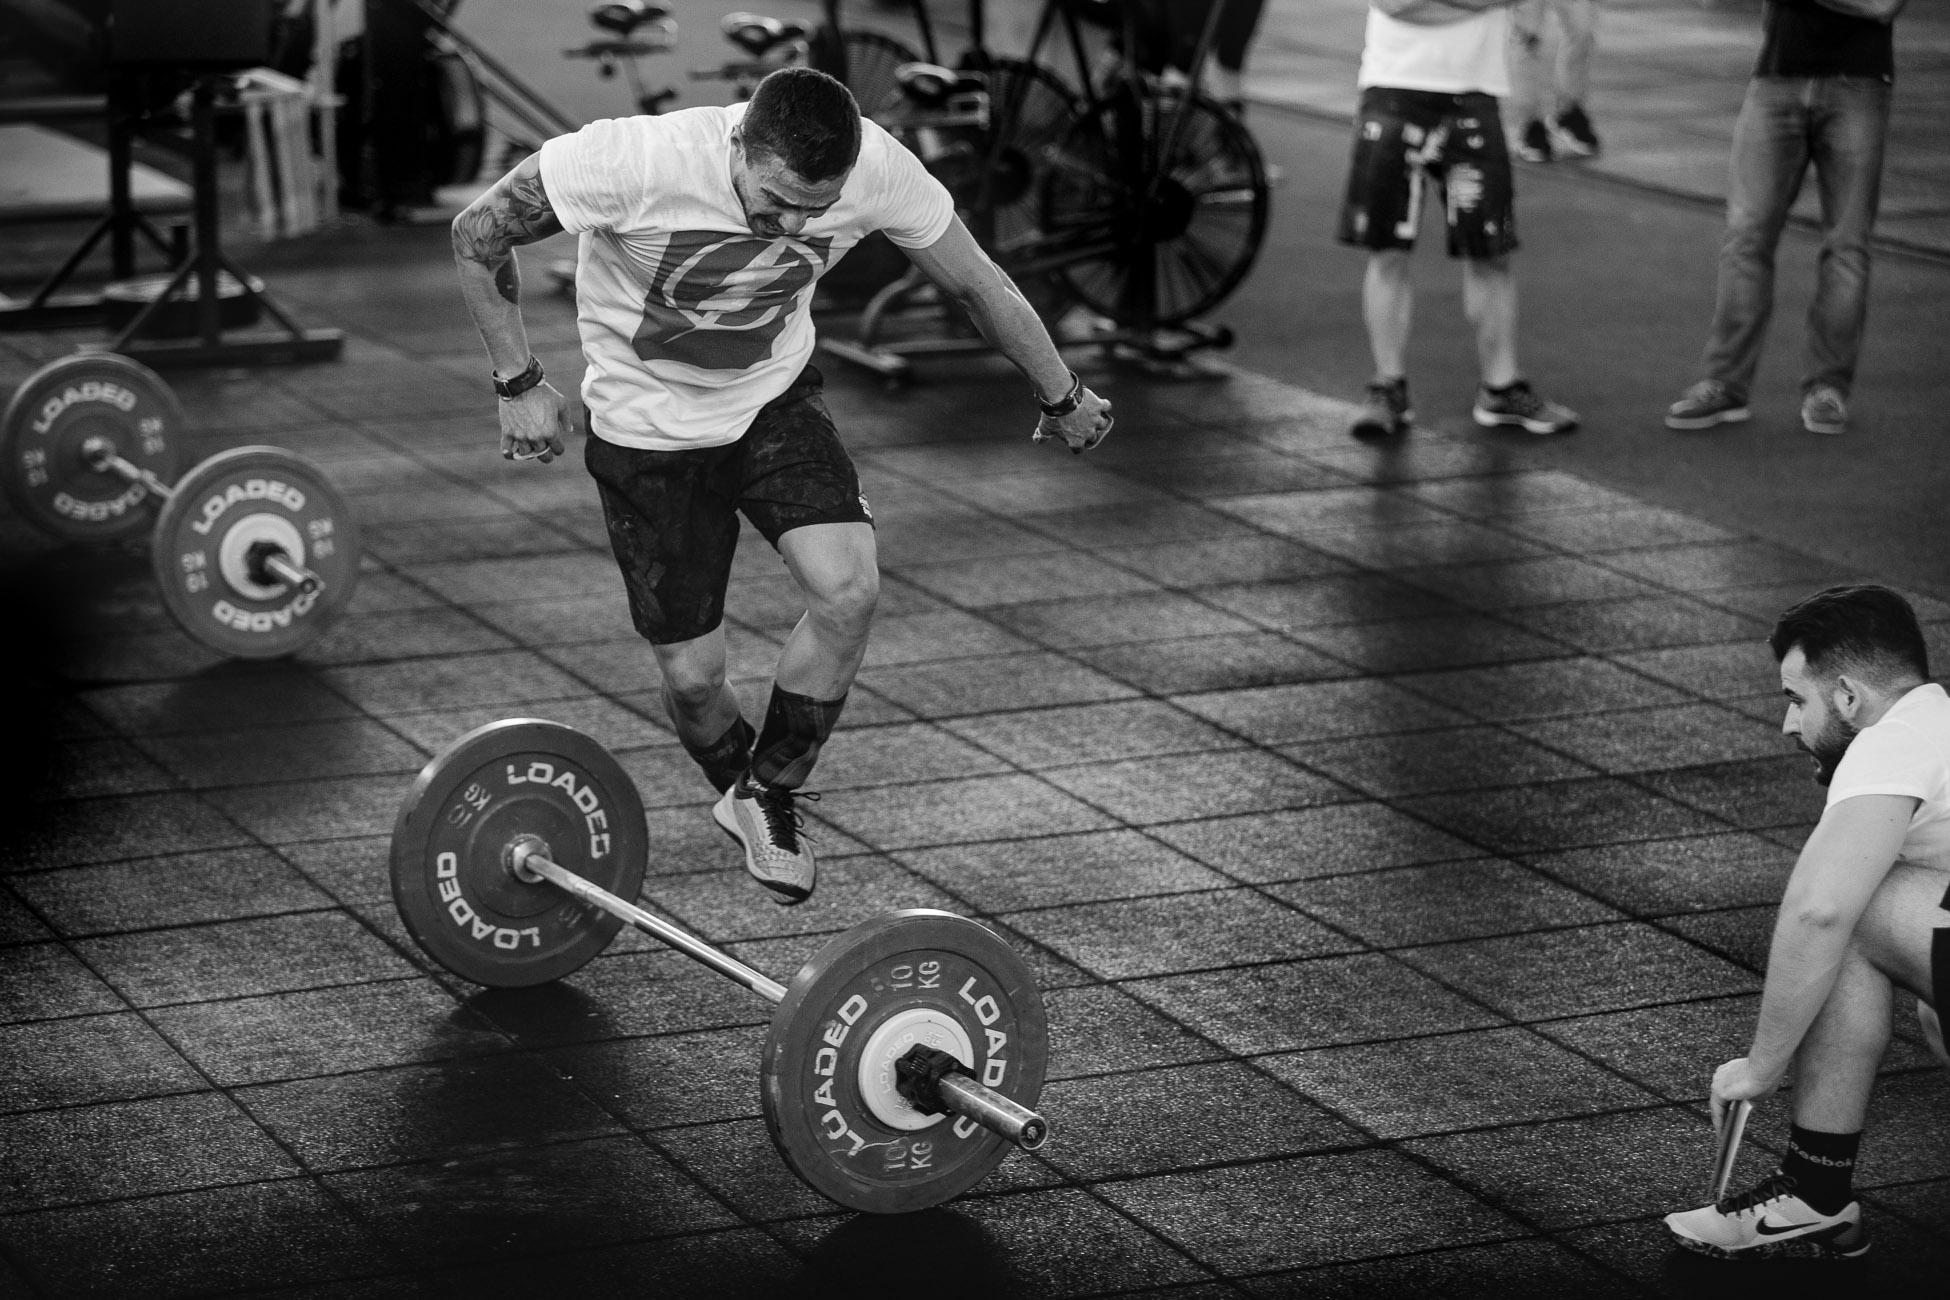 crossfit-games-open-fitness-atleta-fotografia-005.jpg